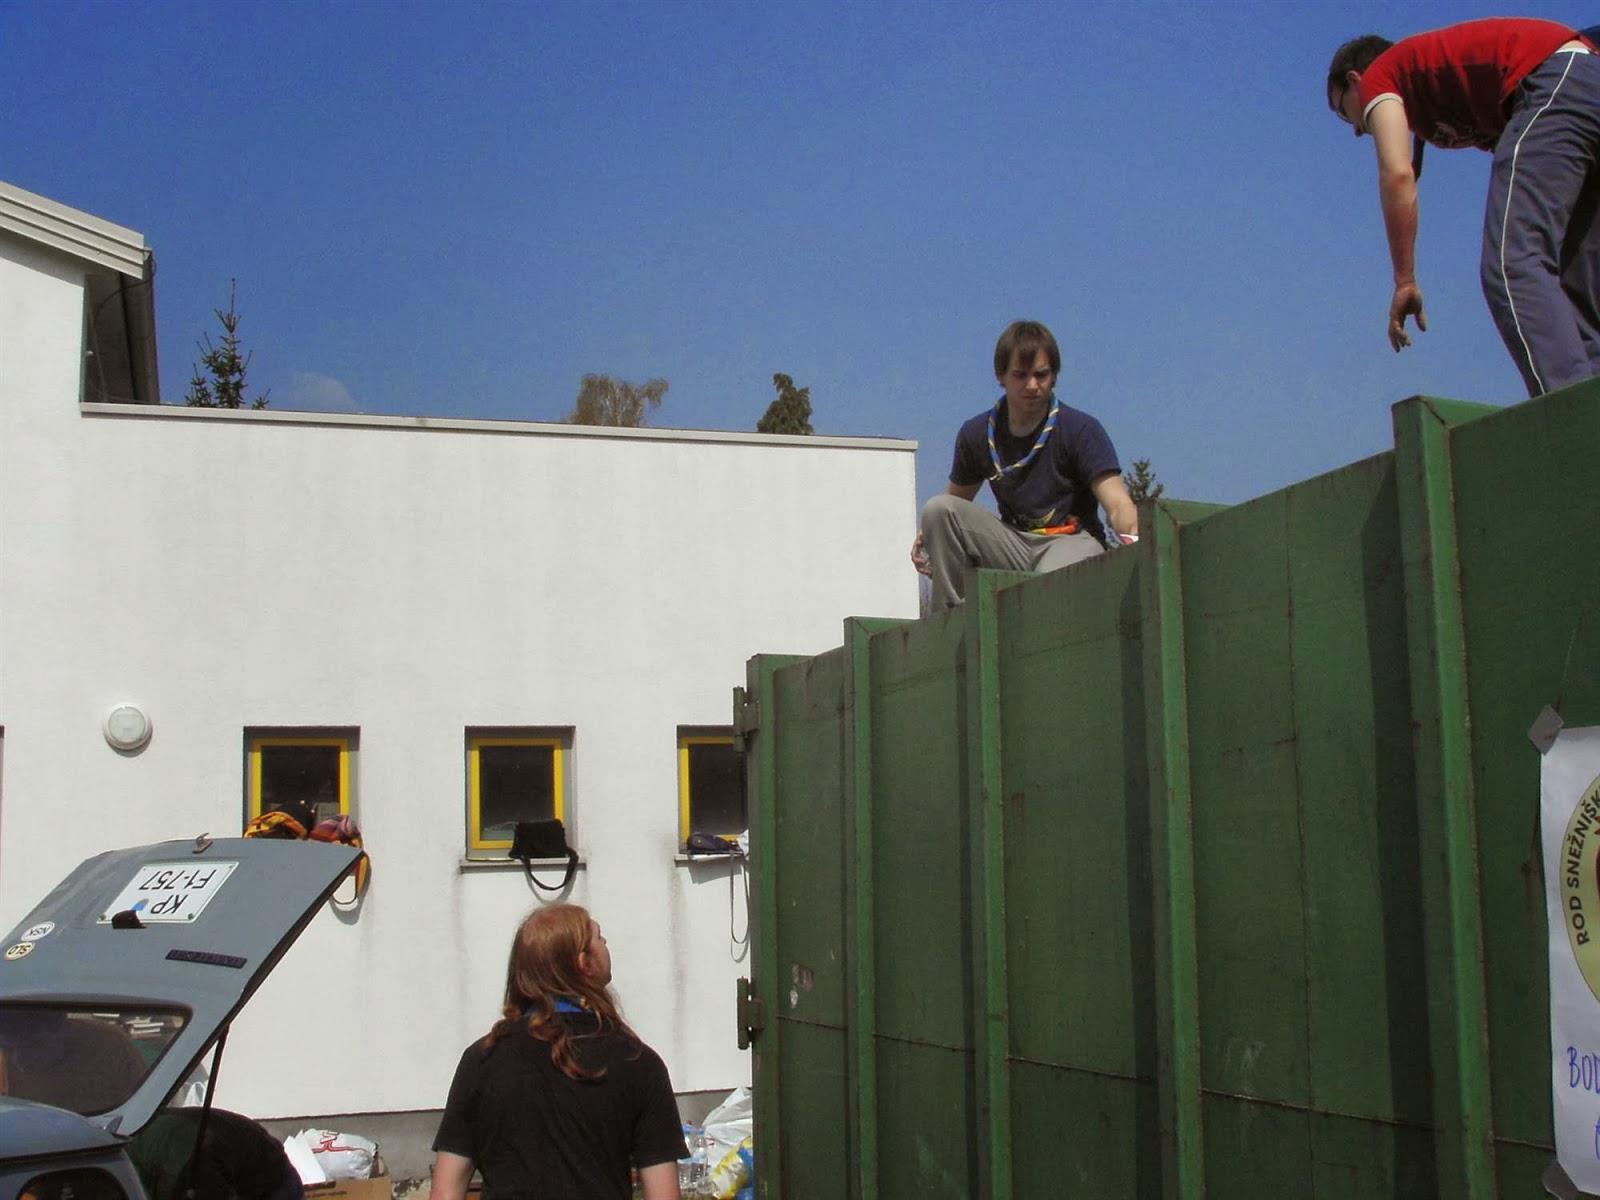 Zbiranje papirja, Ilirska Bistrica 2006 - KIF_8357.JPG